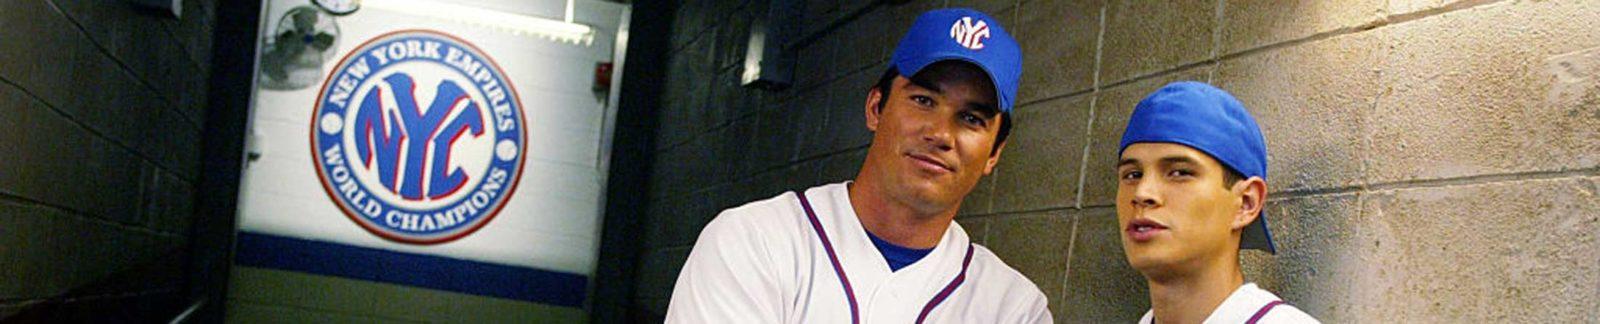 Clubhouse - baseball TV header